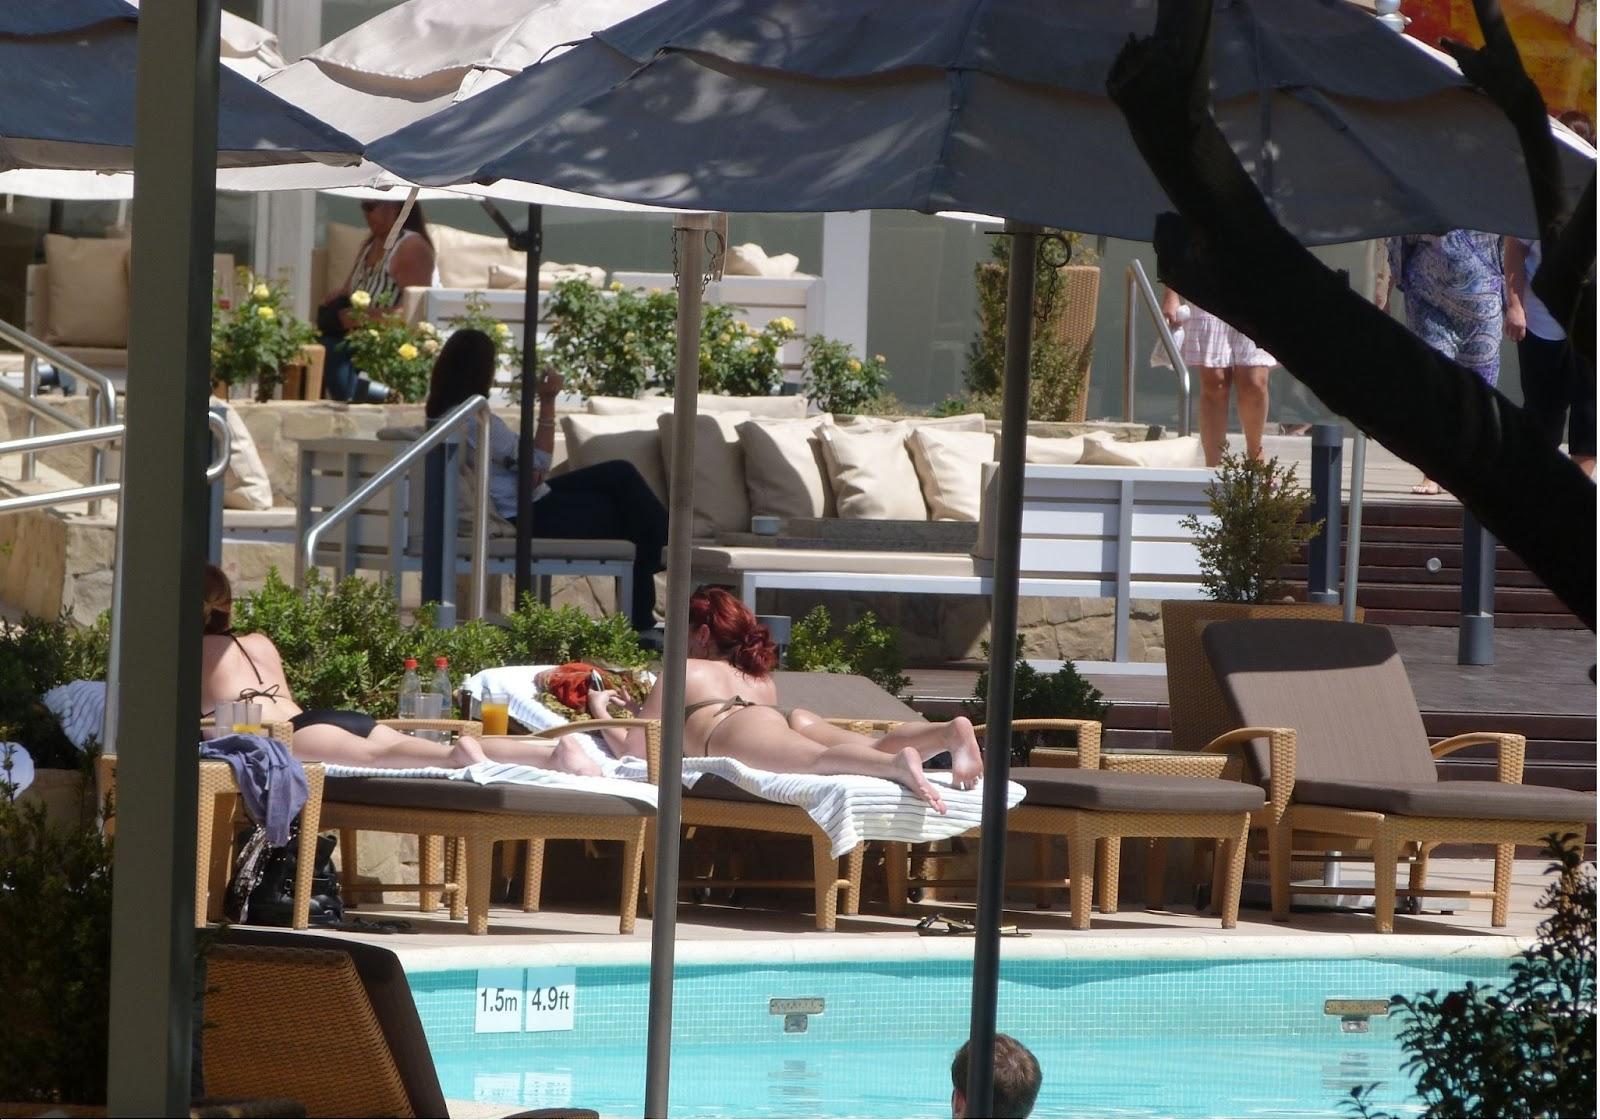 http://1.bp.blogspot.com/-sfj0d0ScDVw/TzQRSo8W8_I/AAAAAAAAA_8/tWm2O39HOsg/s1600/Demi+Lovato+Poolside+(3).jpg